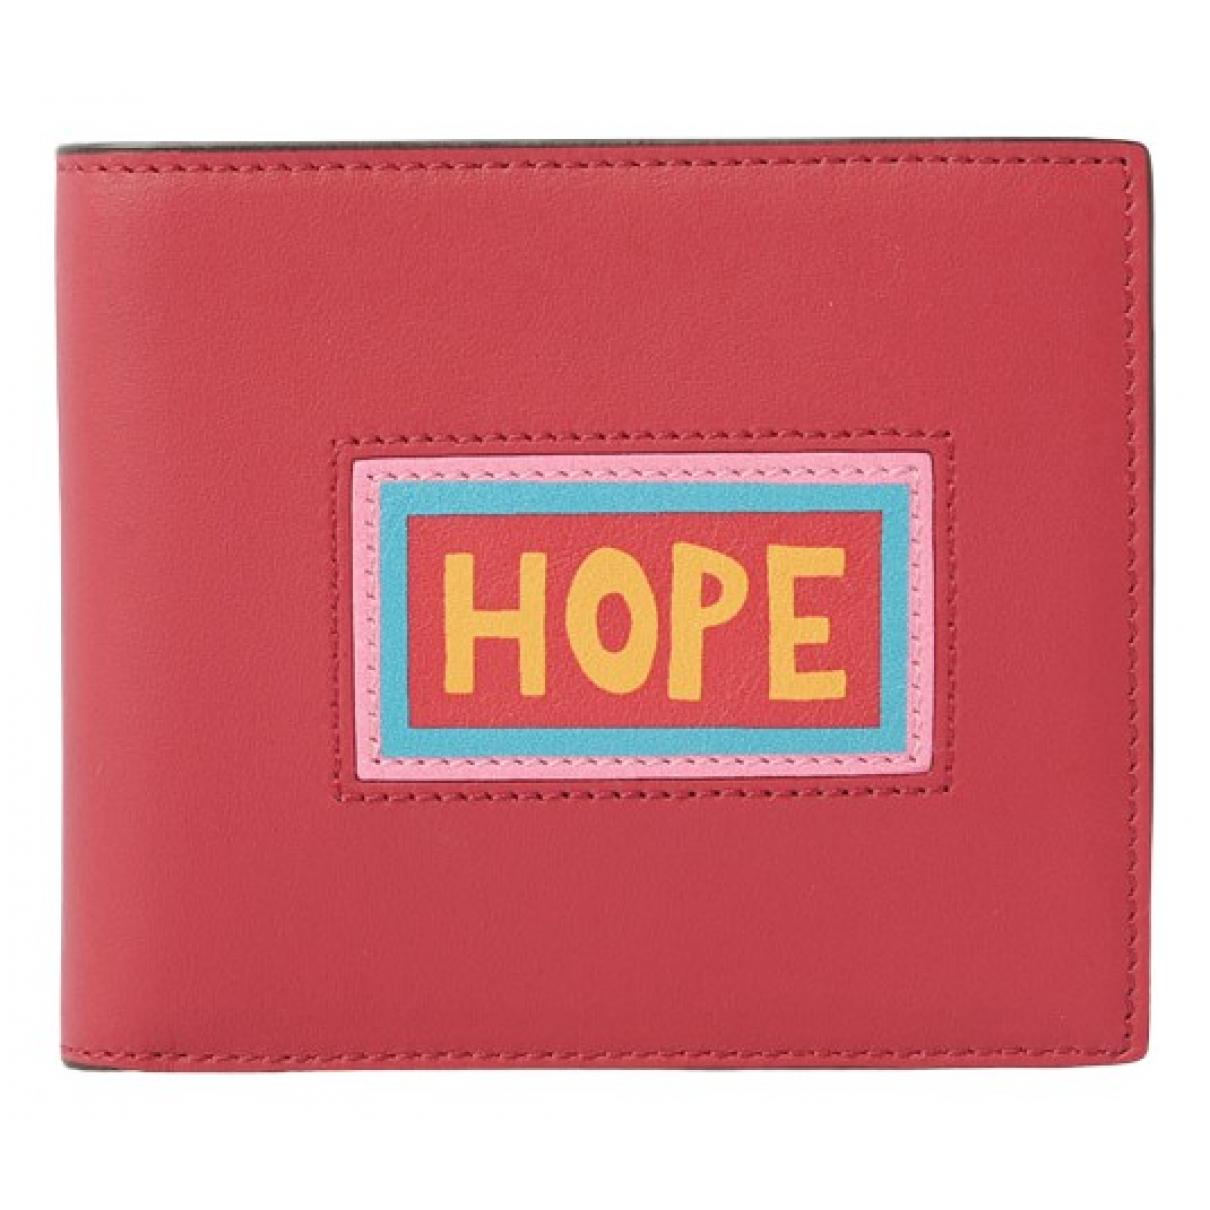 Fendi N Red Leather wallet for Women N